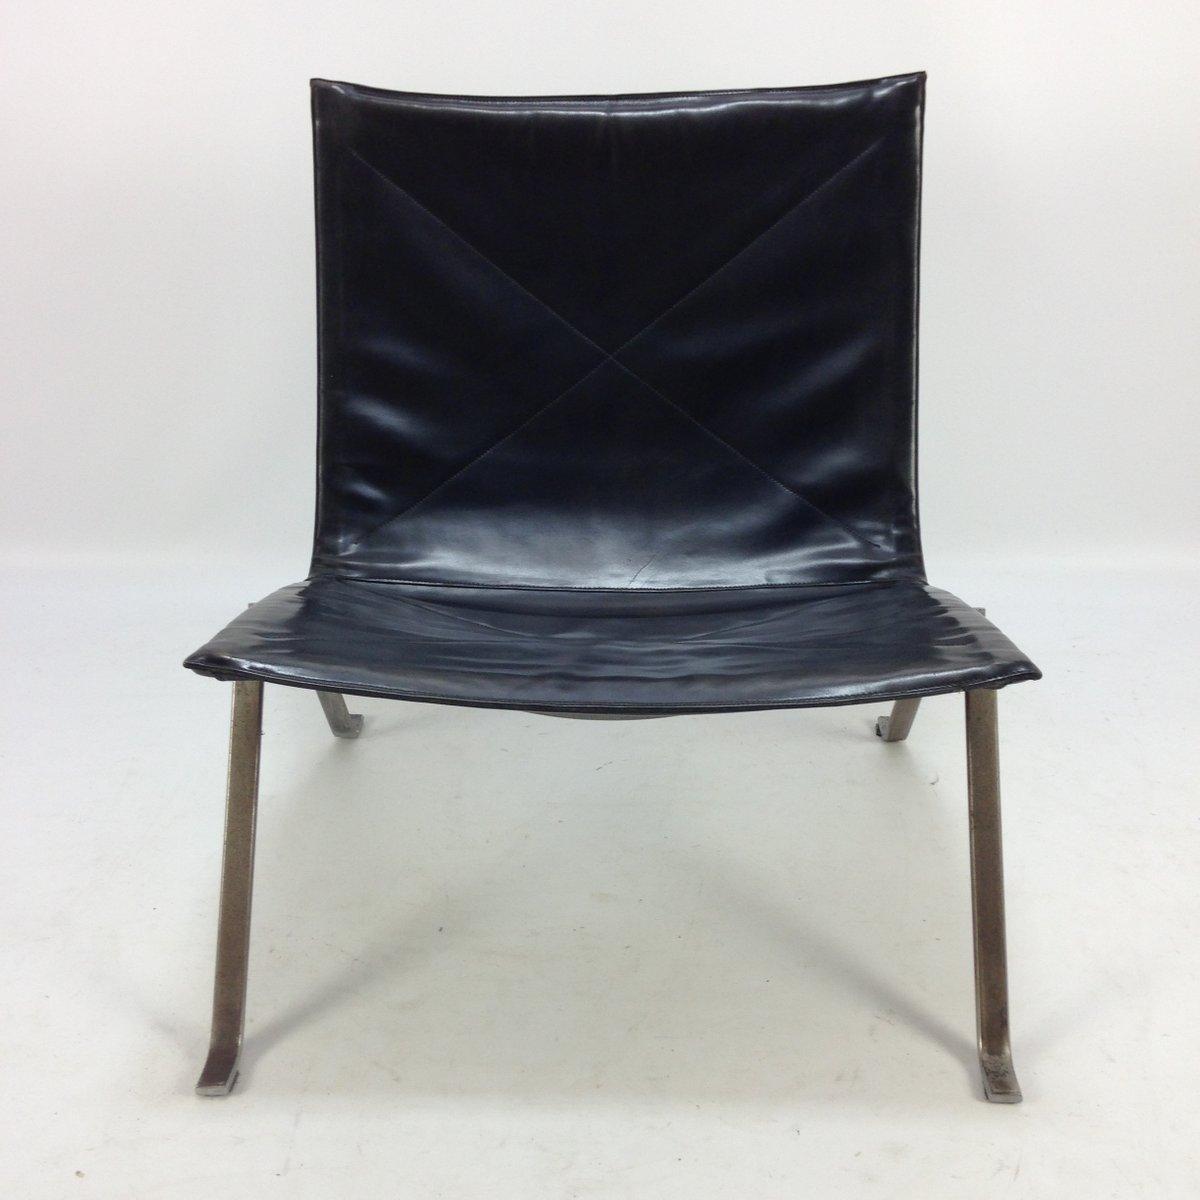 PK22 Sessel von Poul Kjaerholm für E. Kold Christensen, 1950er